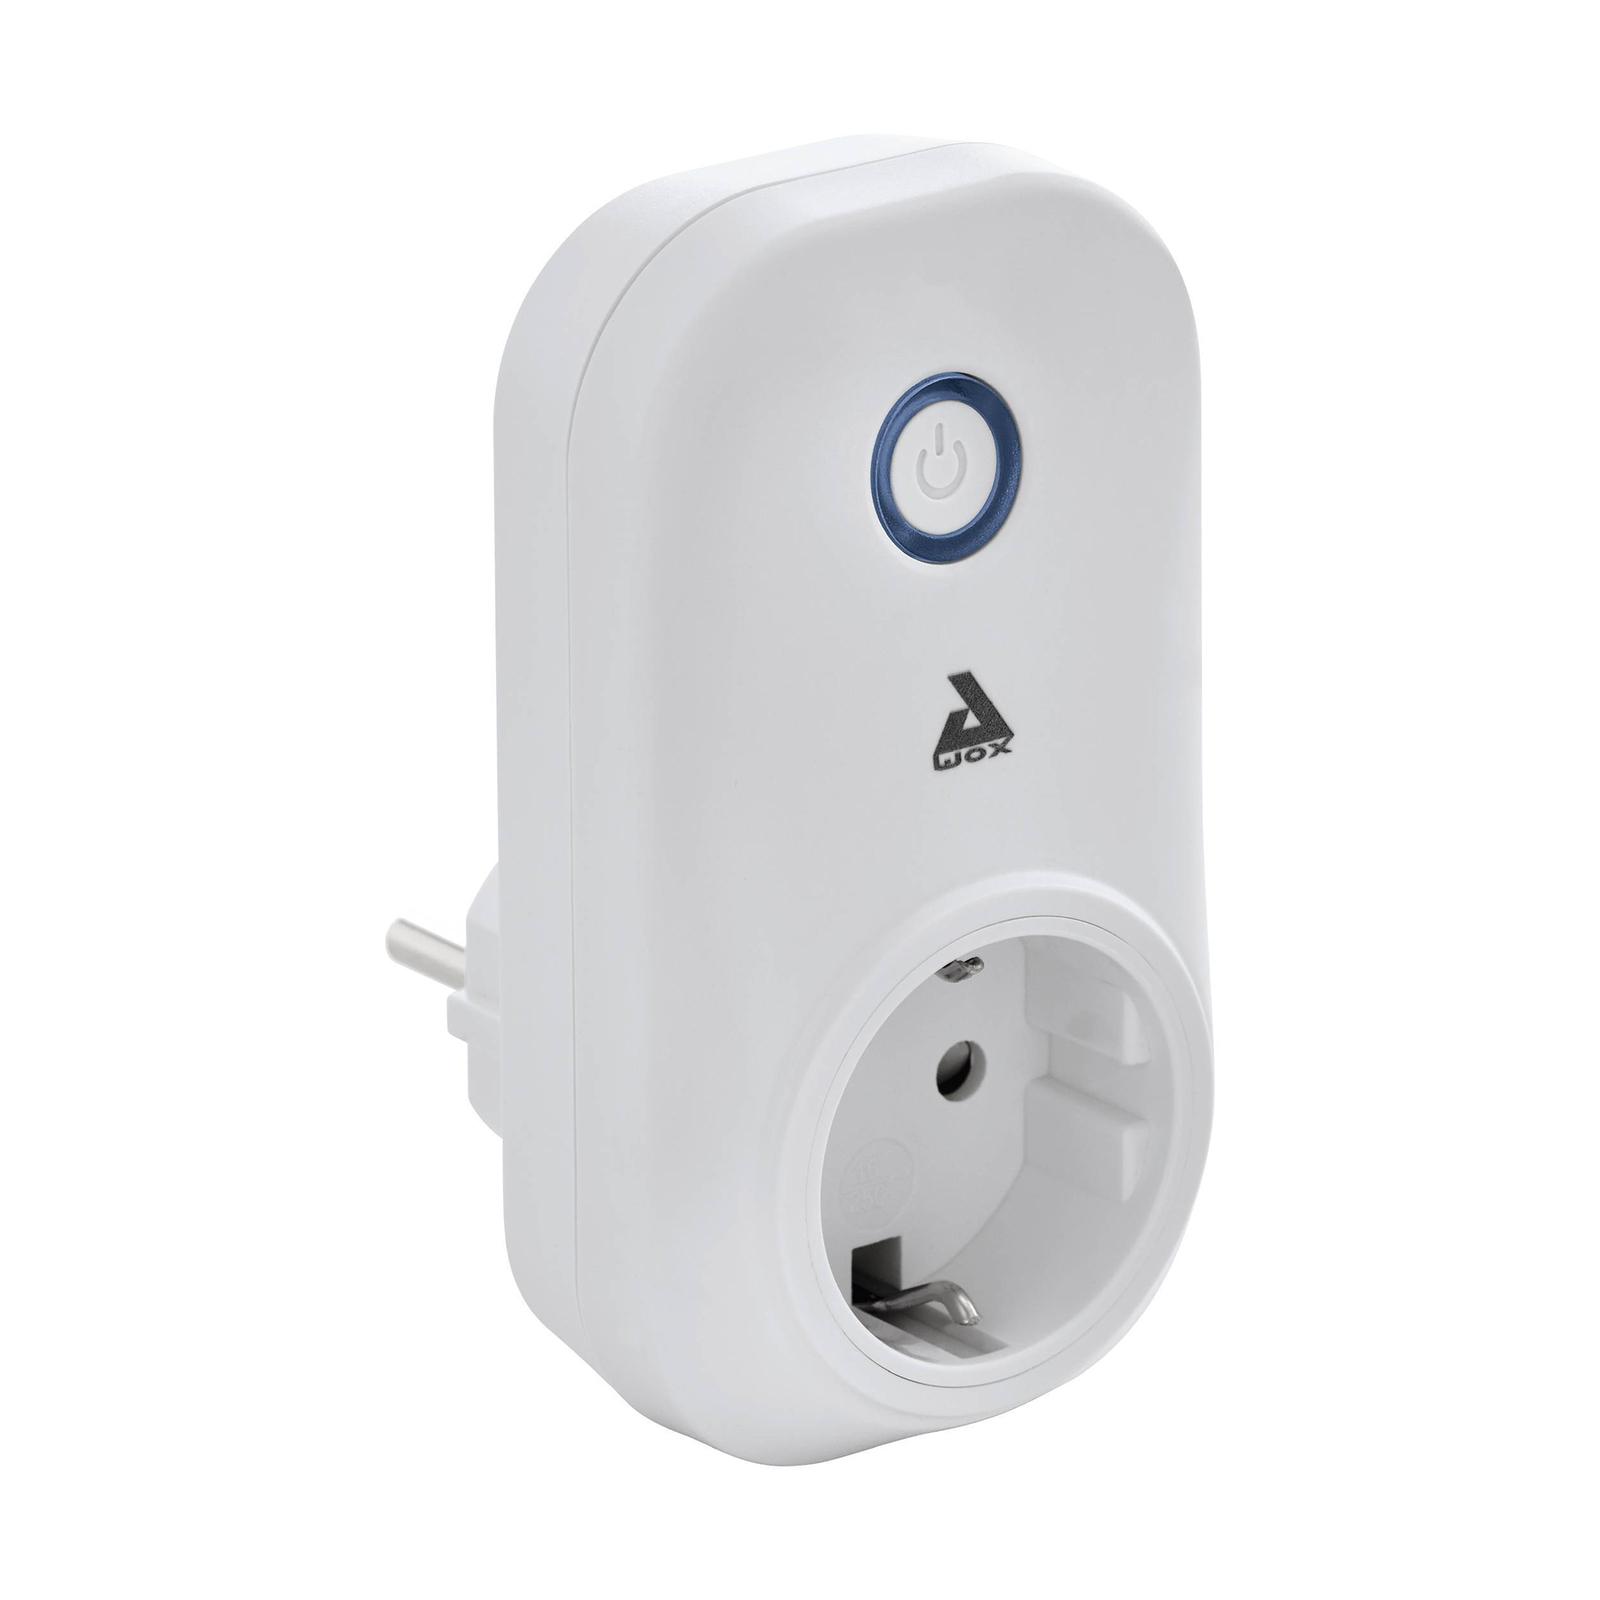 EGLO connect Plug Bluetooth-eluttag